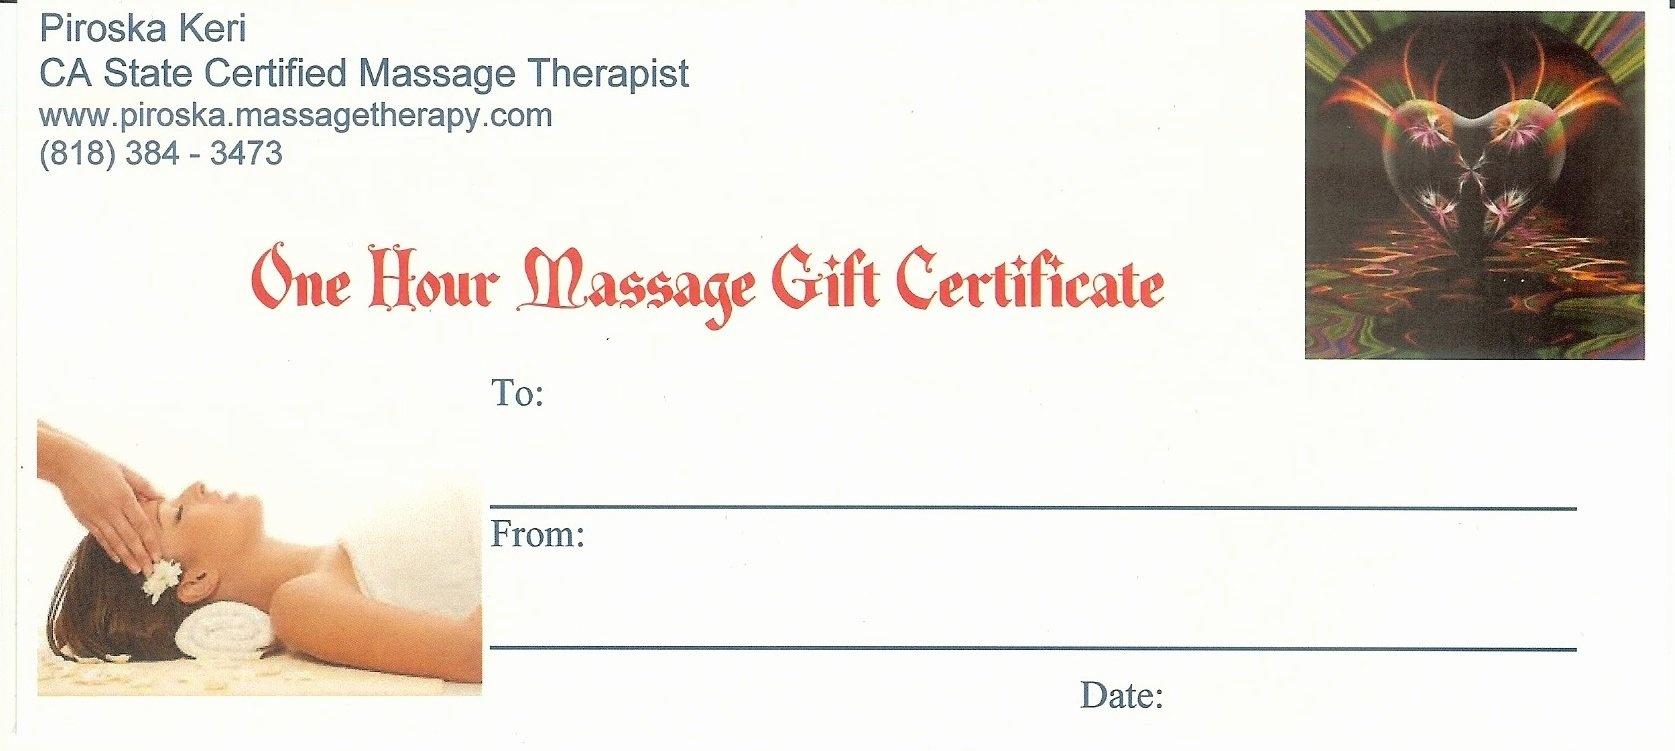 Gift Certificate Template Massage | Craigsbrother - Free Printable Gift Certificate Templates For Massage